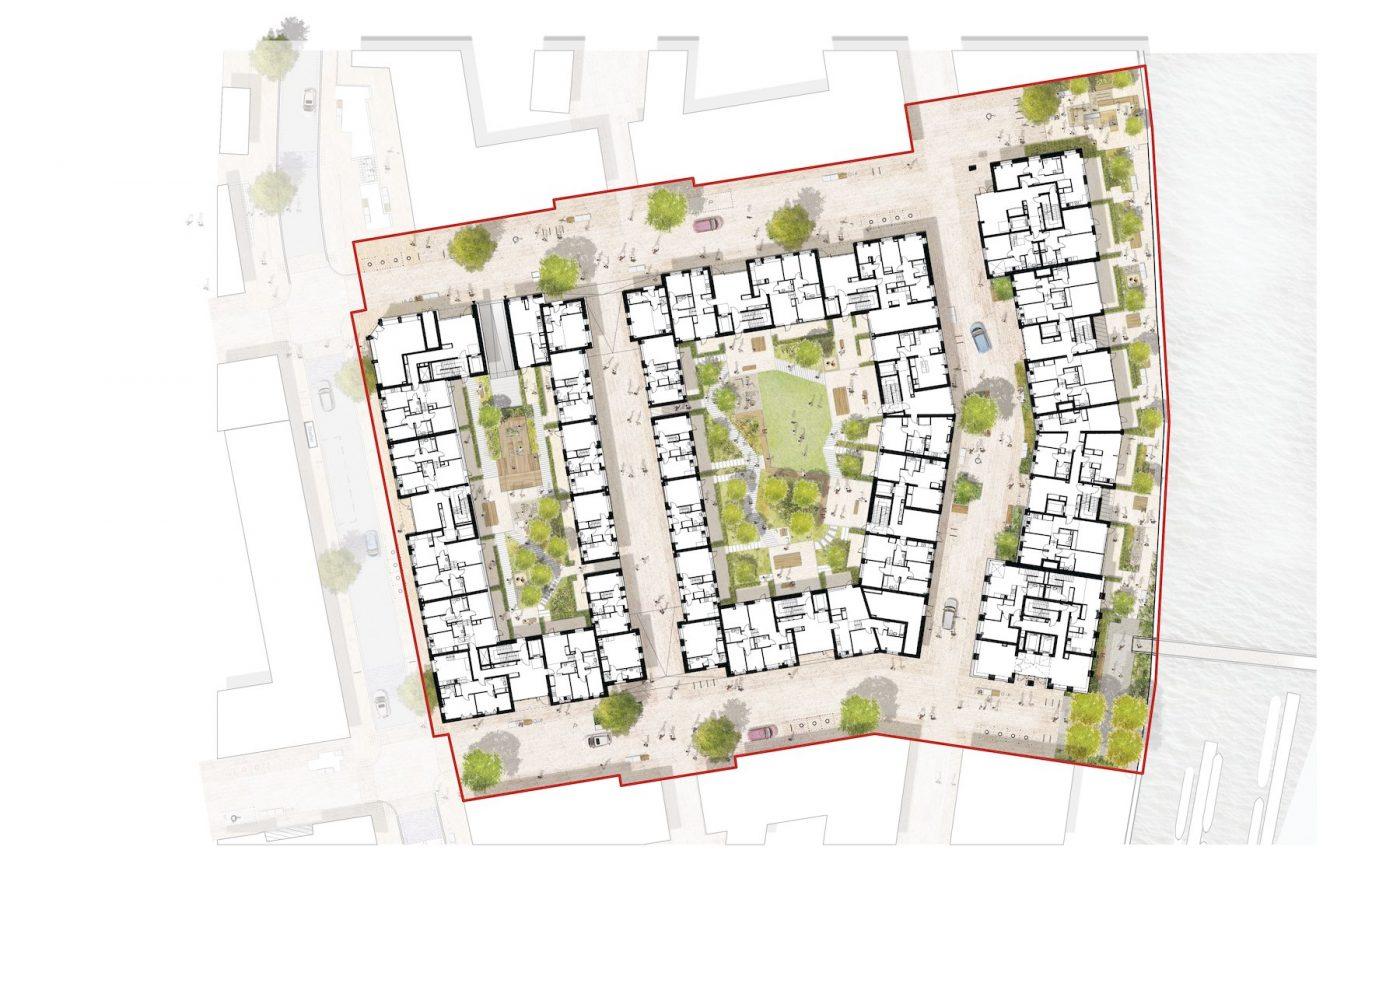 1520 Strand East R2 Plan